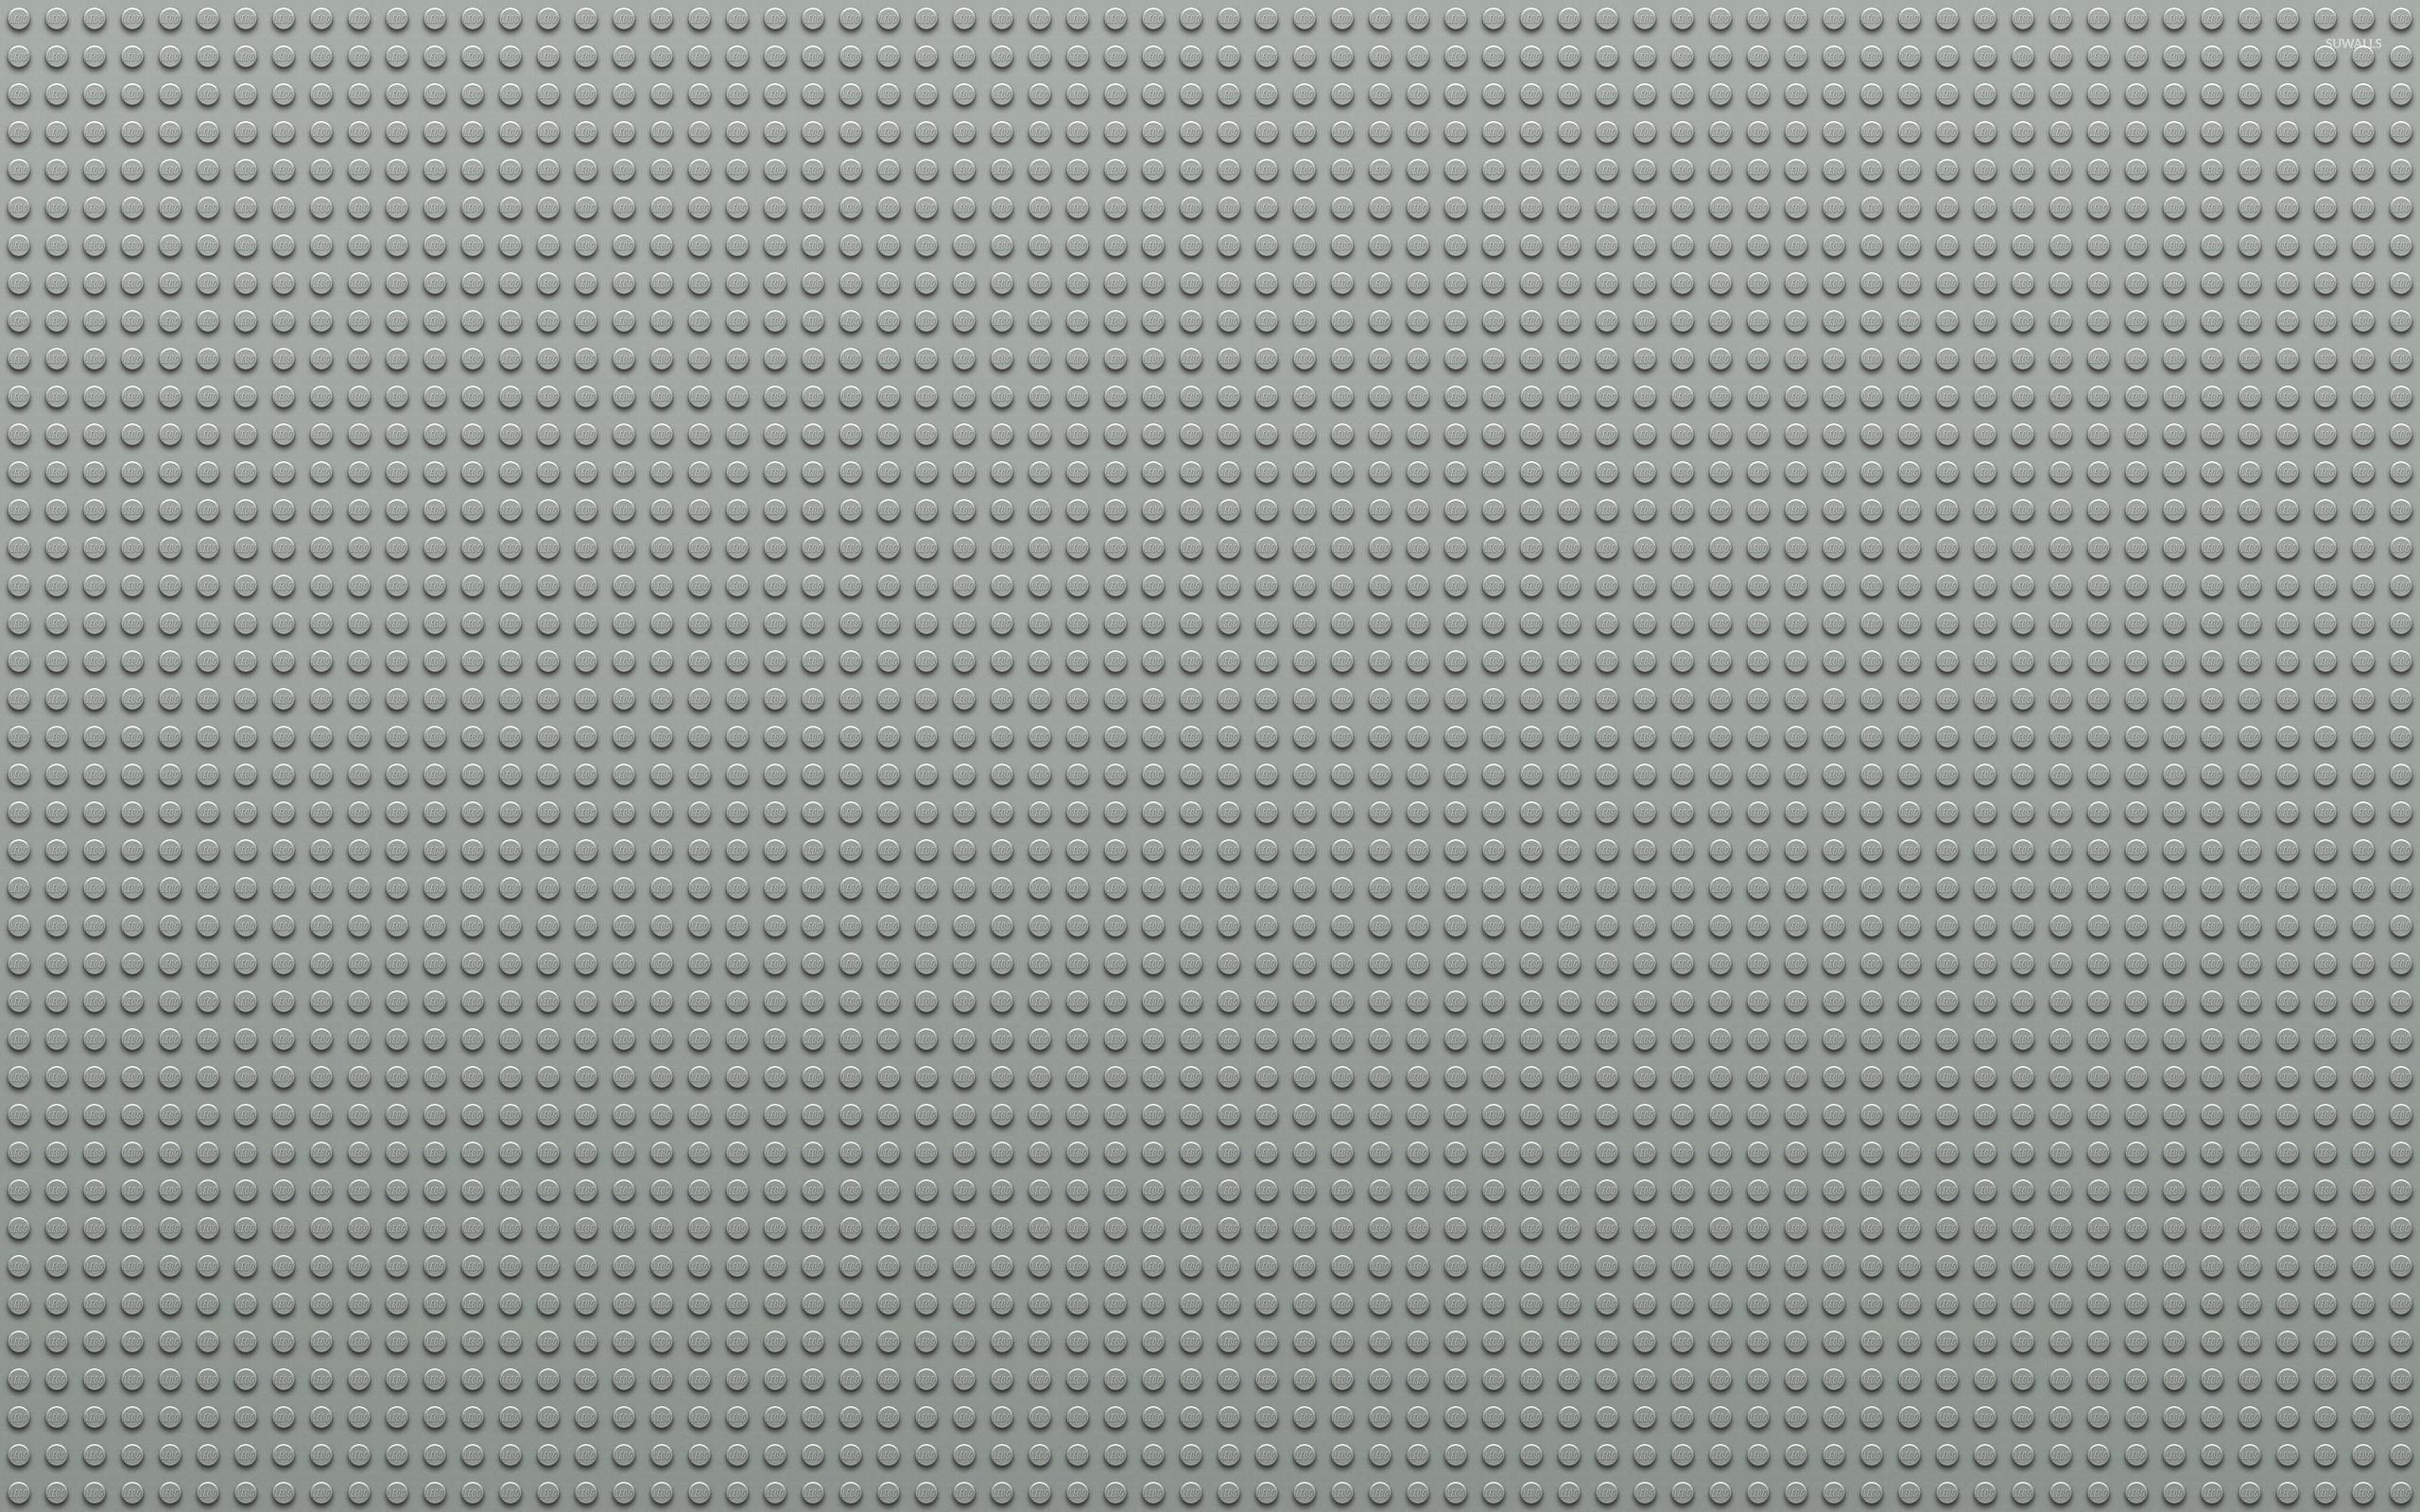 Gray Lego Board Wallpaper Digital Art Wallpapers 44374